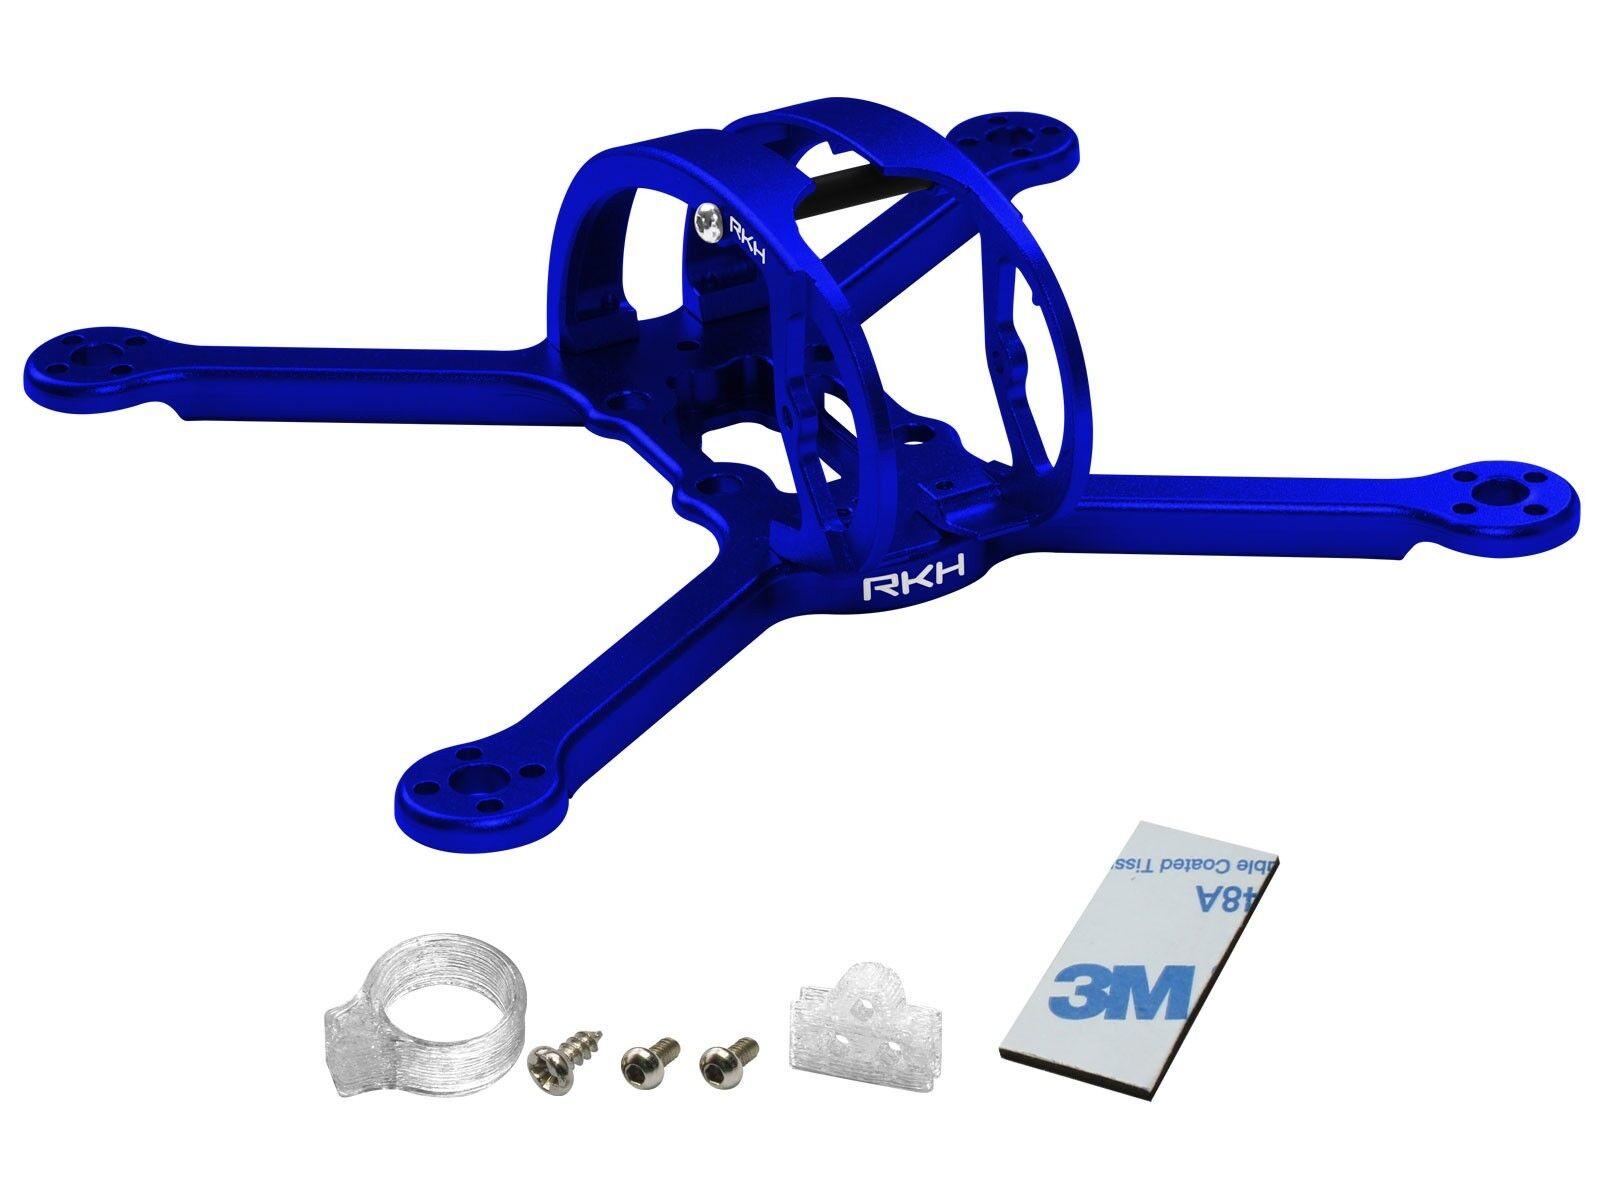 Rakonheli CNC Aluminum 3inch Kit (bluee) - EMAX Babyhawk R